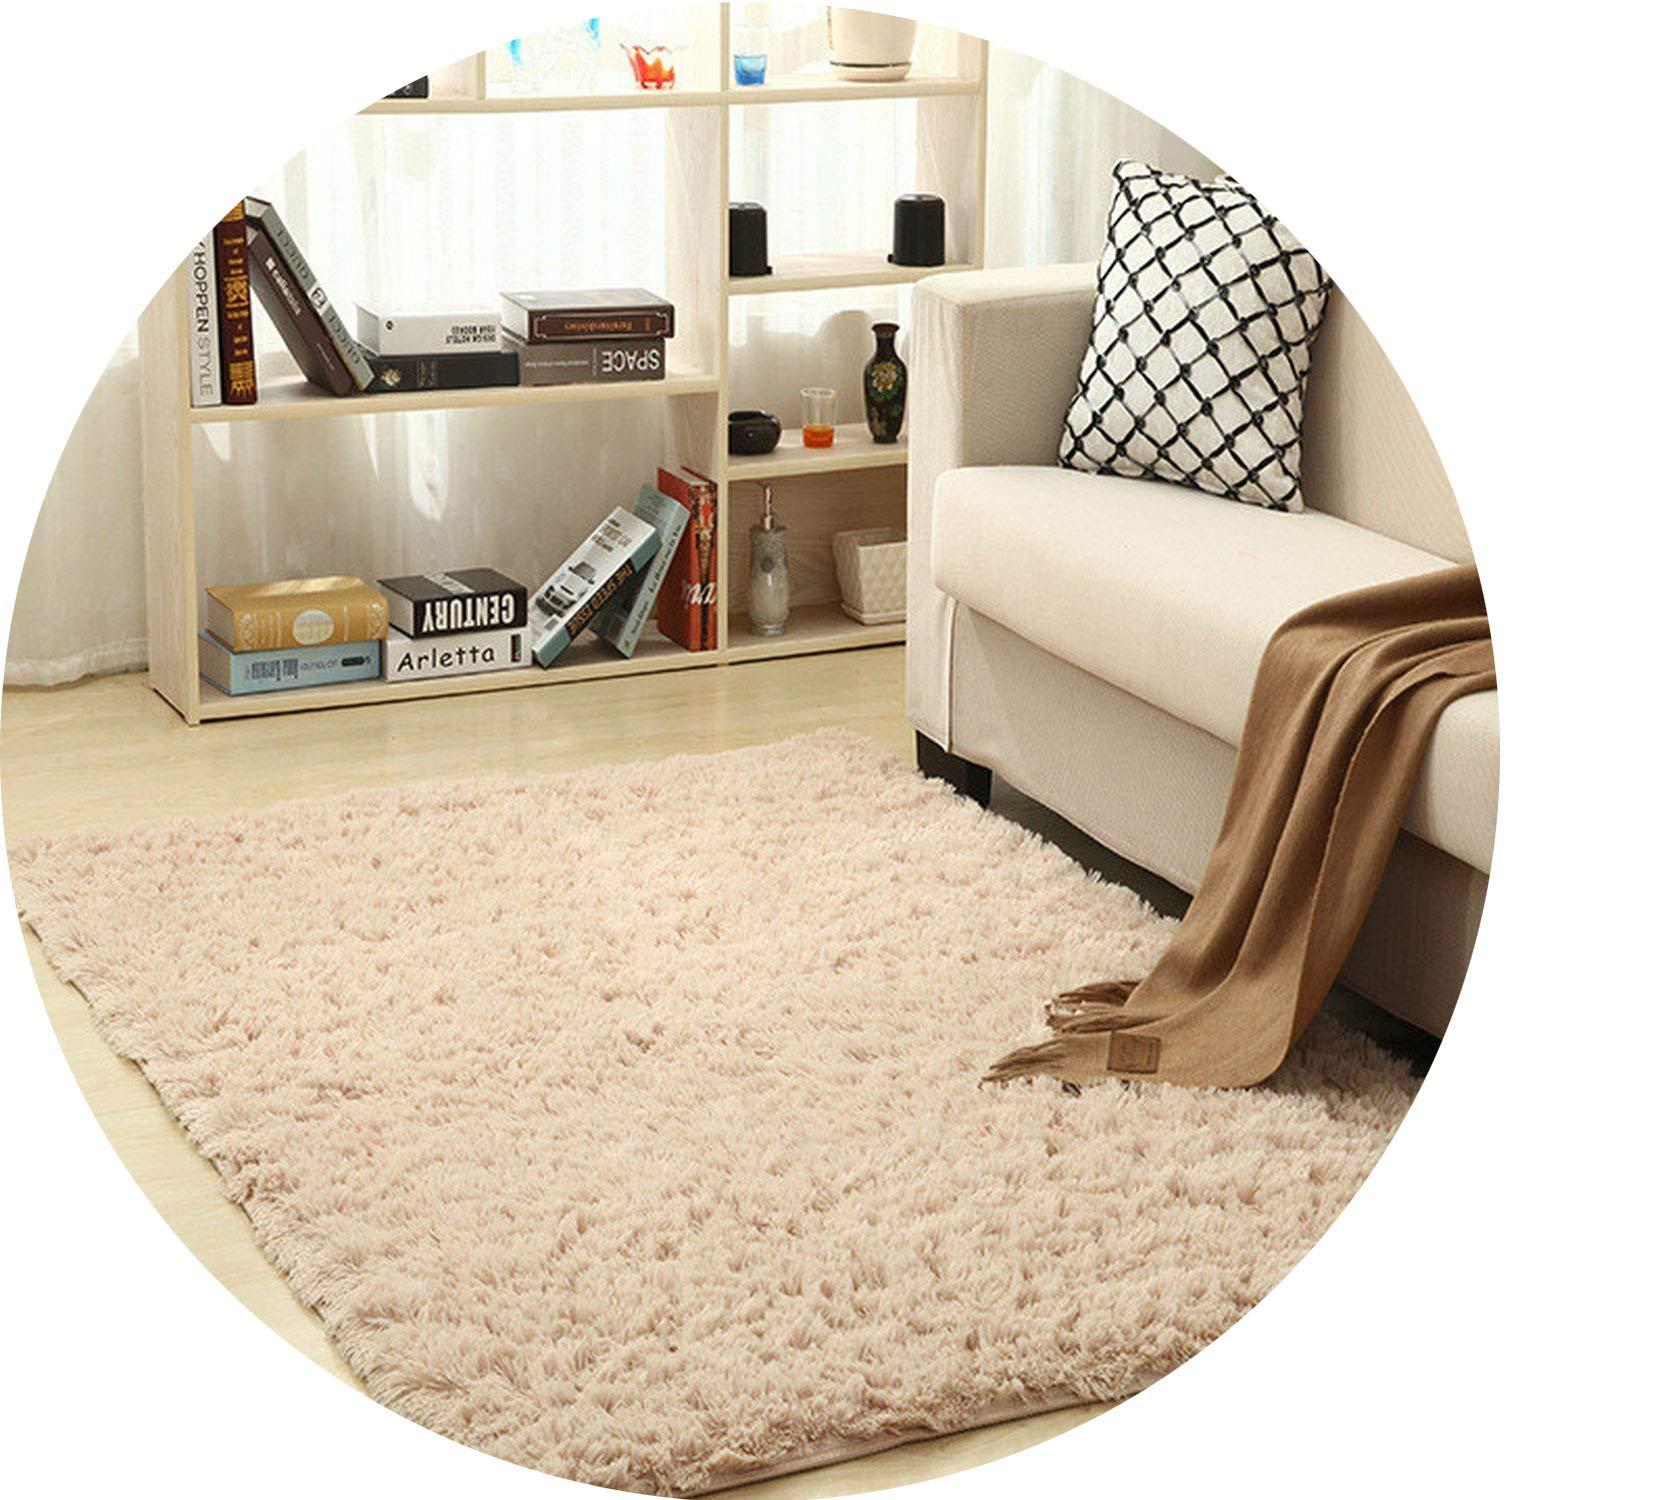 Super Soft Silk Wool Rug Indoor Modern Shag Area Rug Silky Rugs Bedroom Floor Mat Baby Nursery Rug Children Carpet,Shallow,160X200cm by Ting room